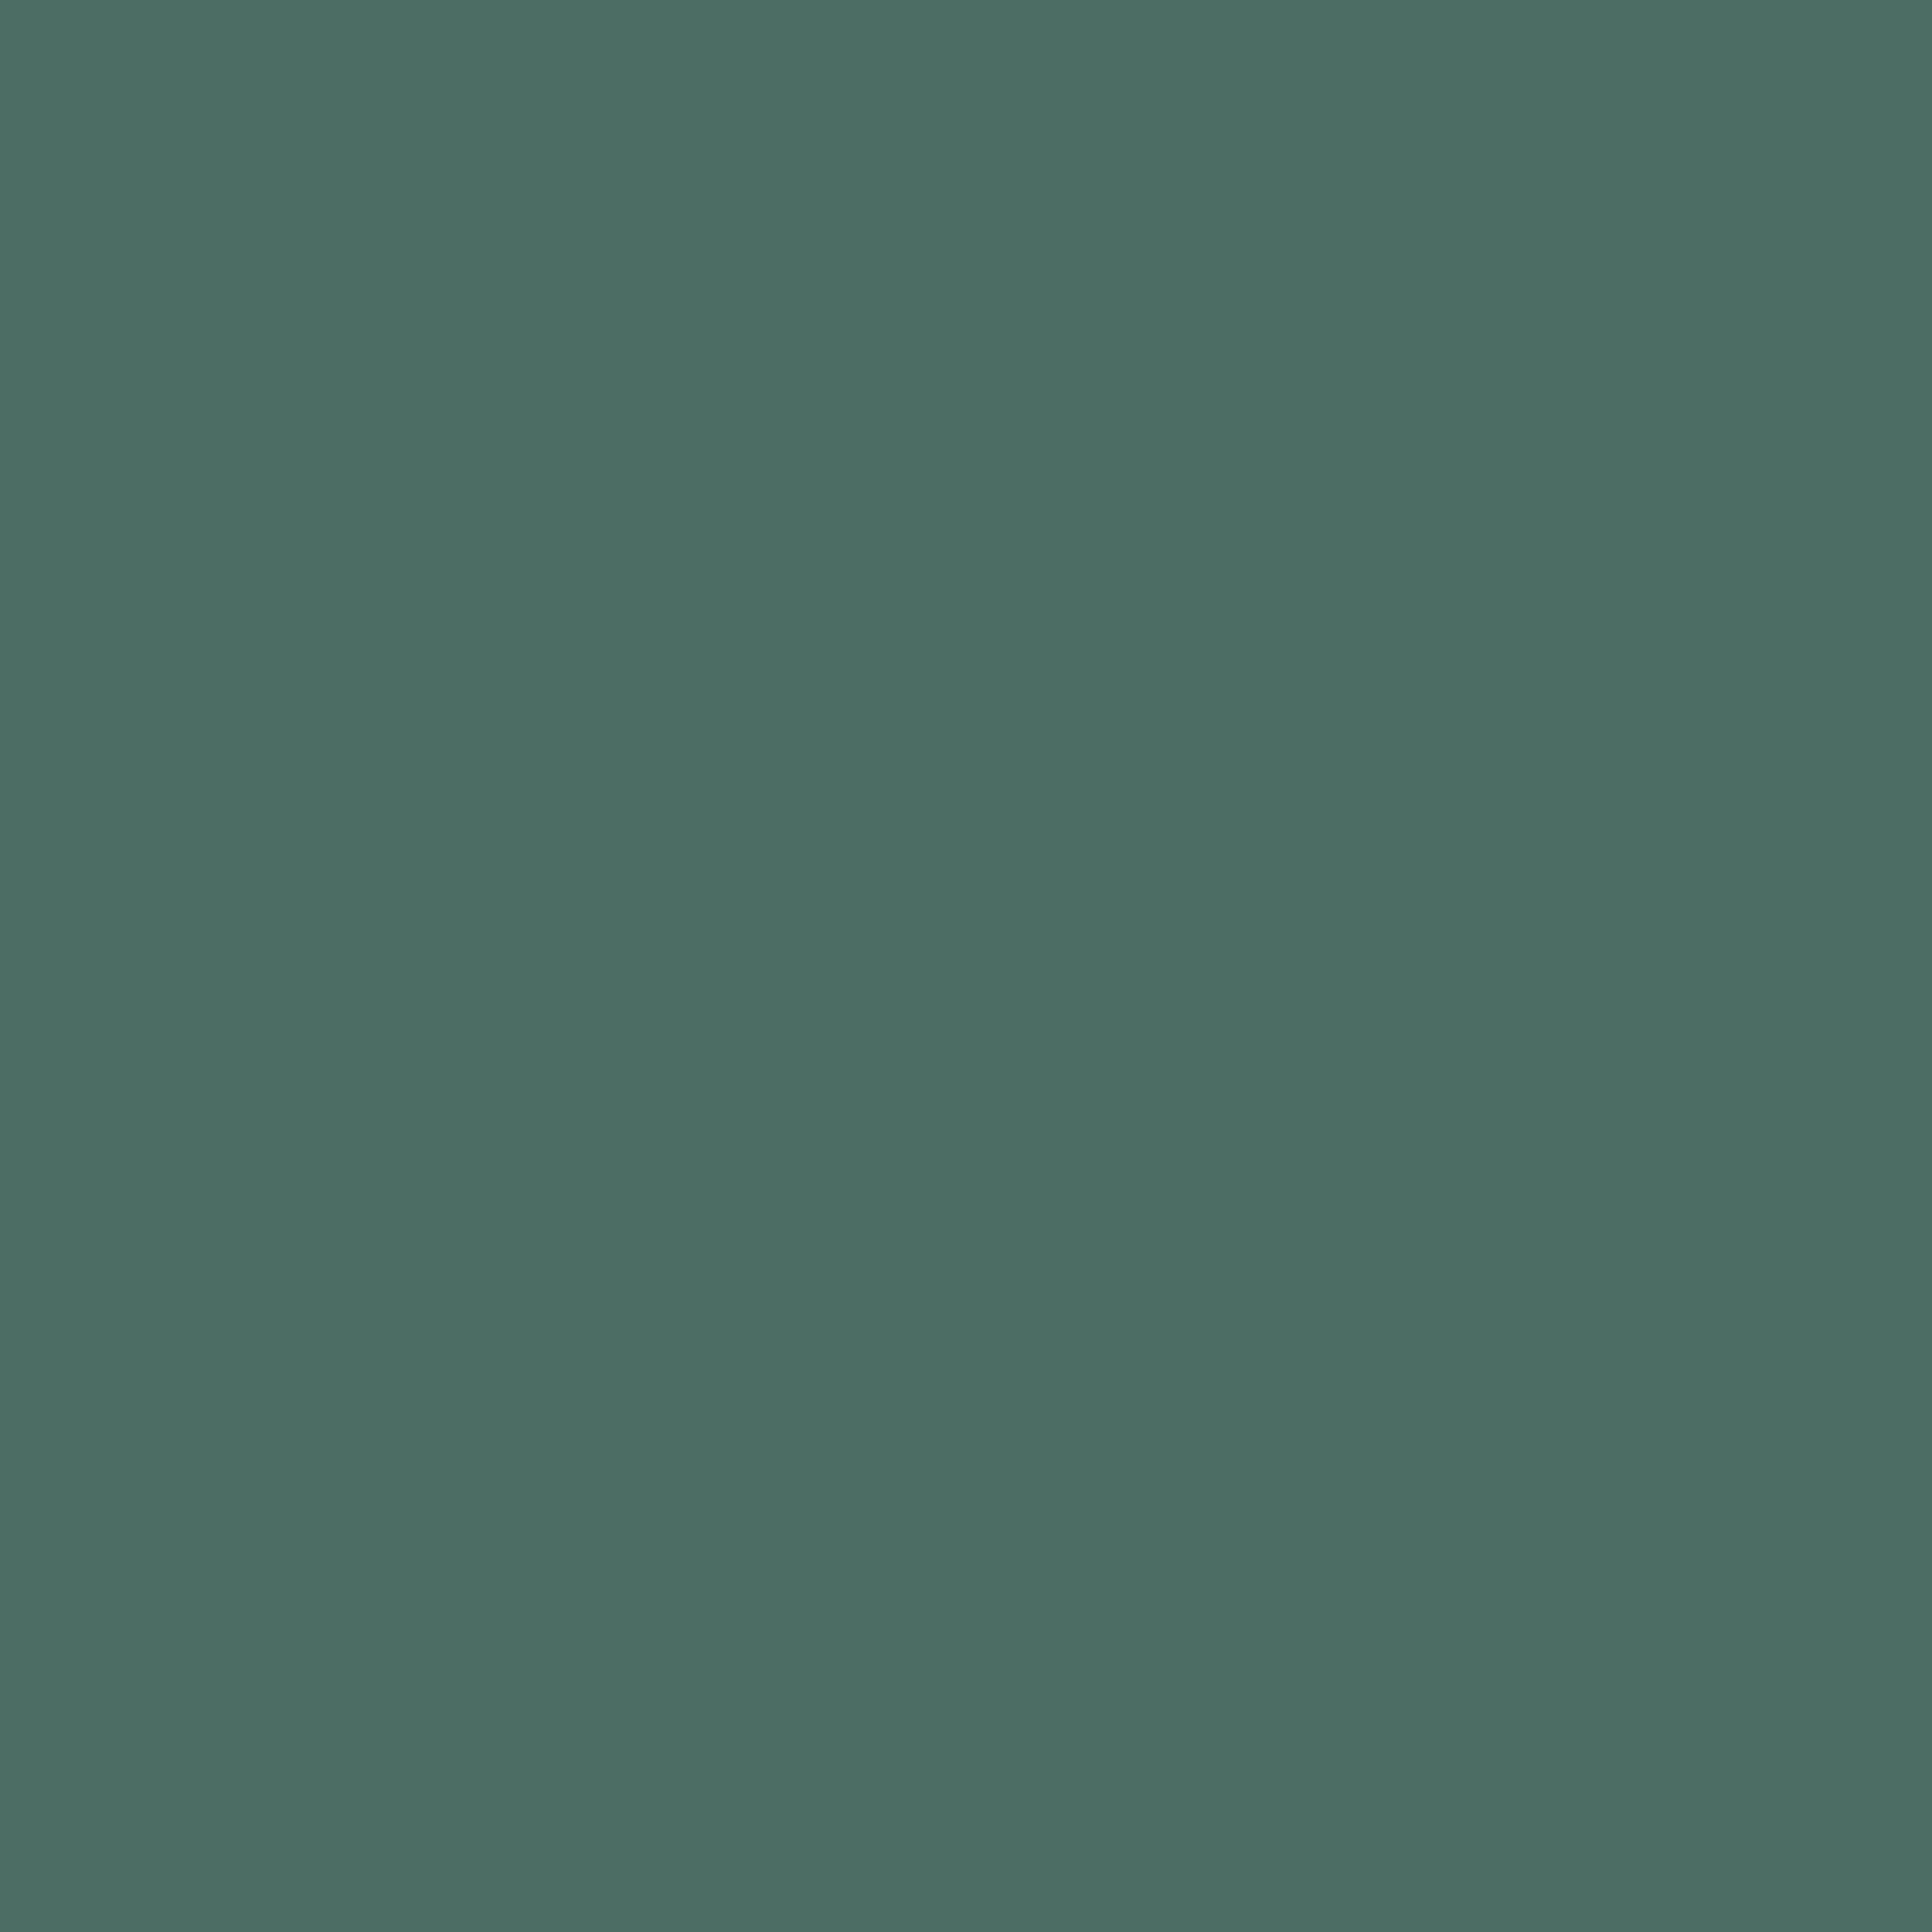 Trekkinggreen